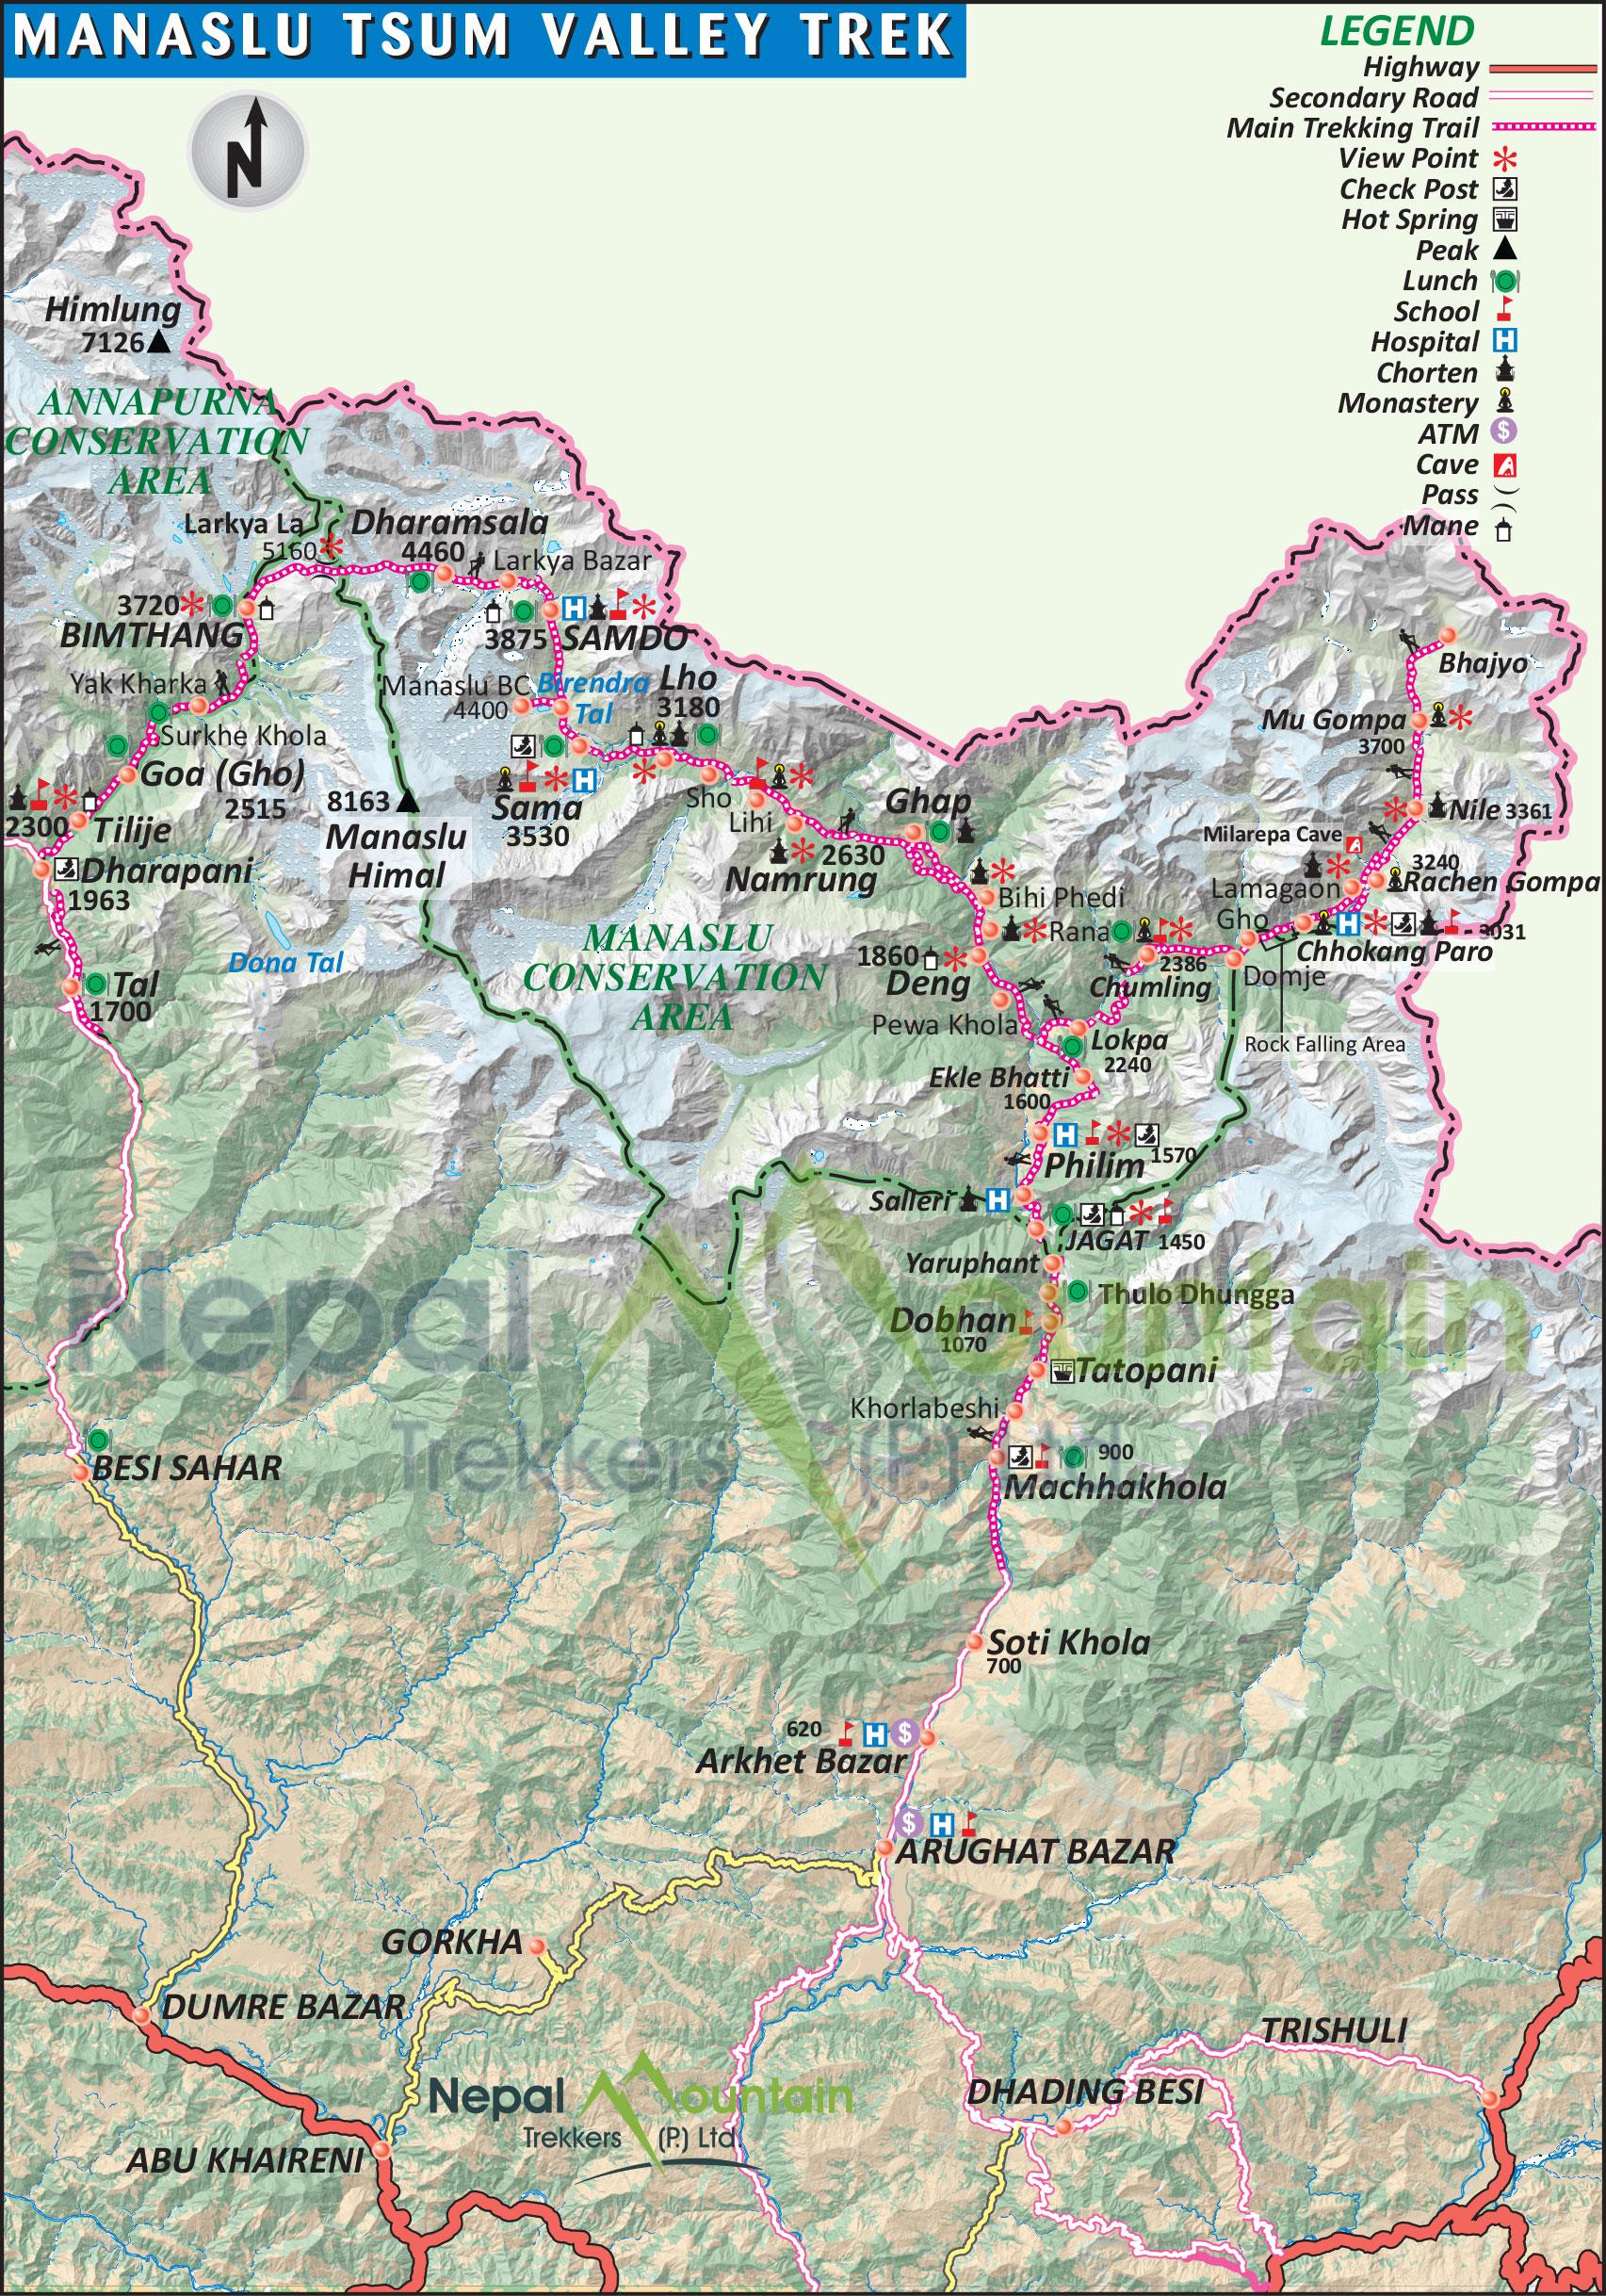 map of Manaslu Tsum Valley Trek